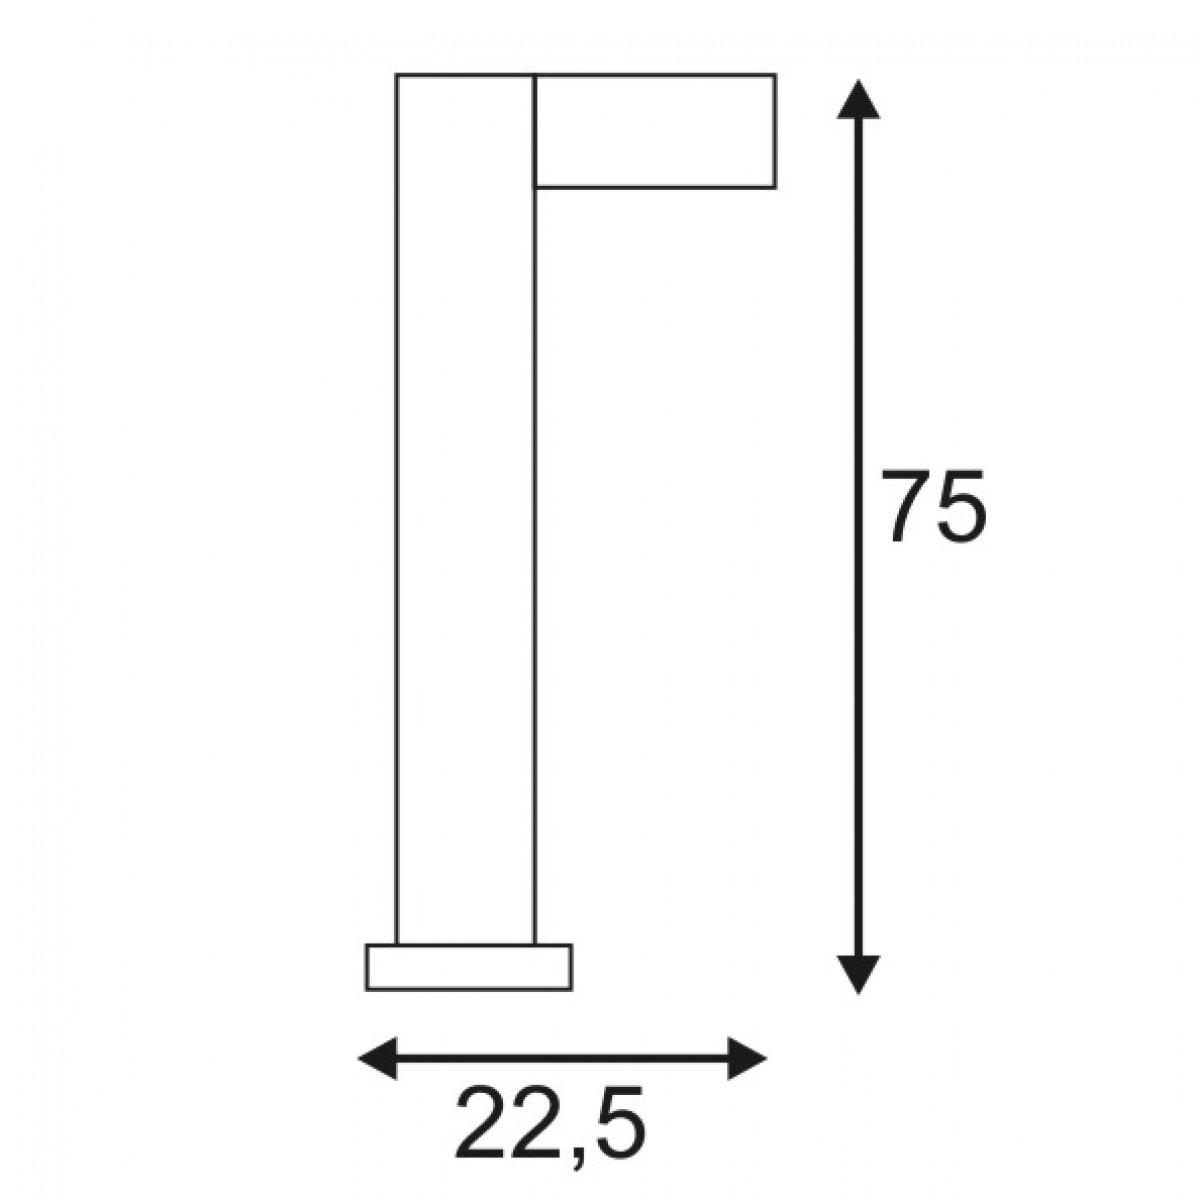 Quadrasyl Sl 75 Square Anthrazit 1xgx53